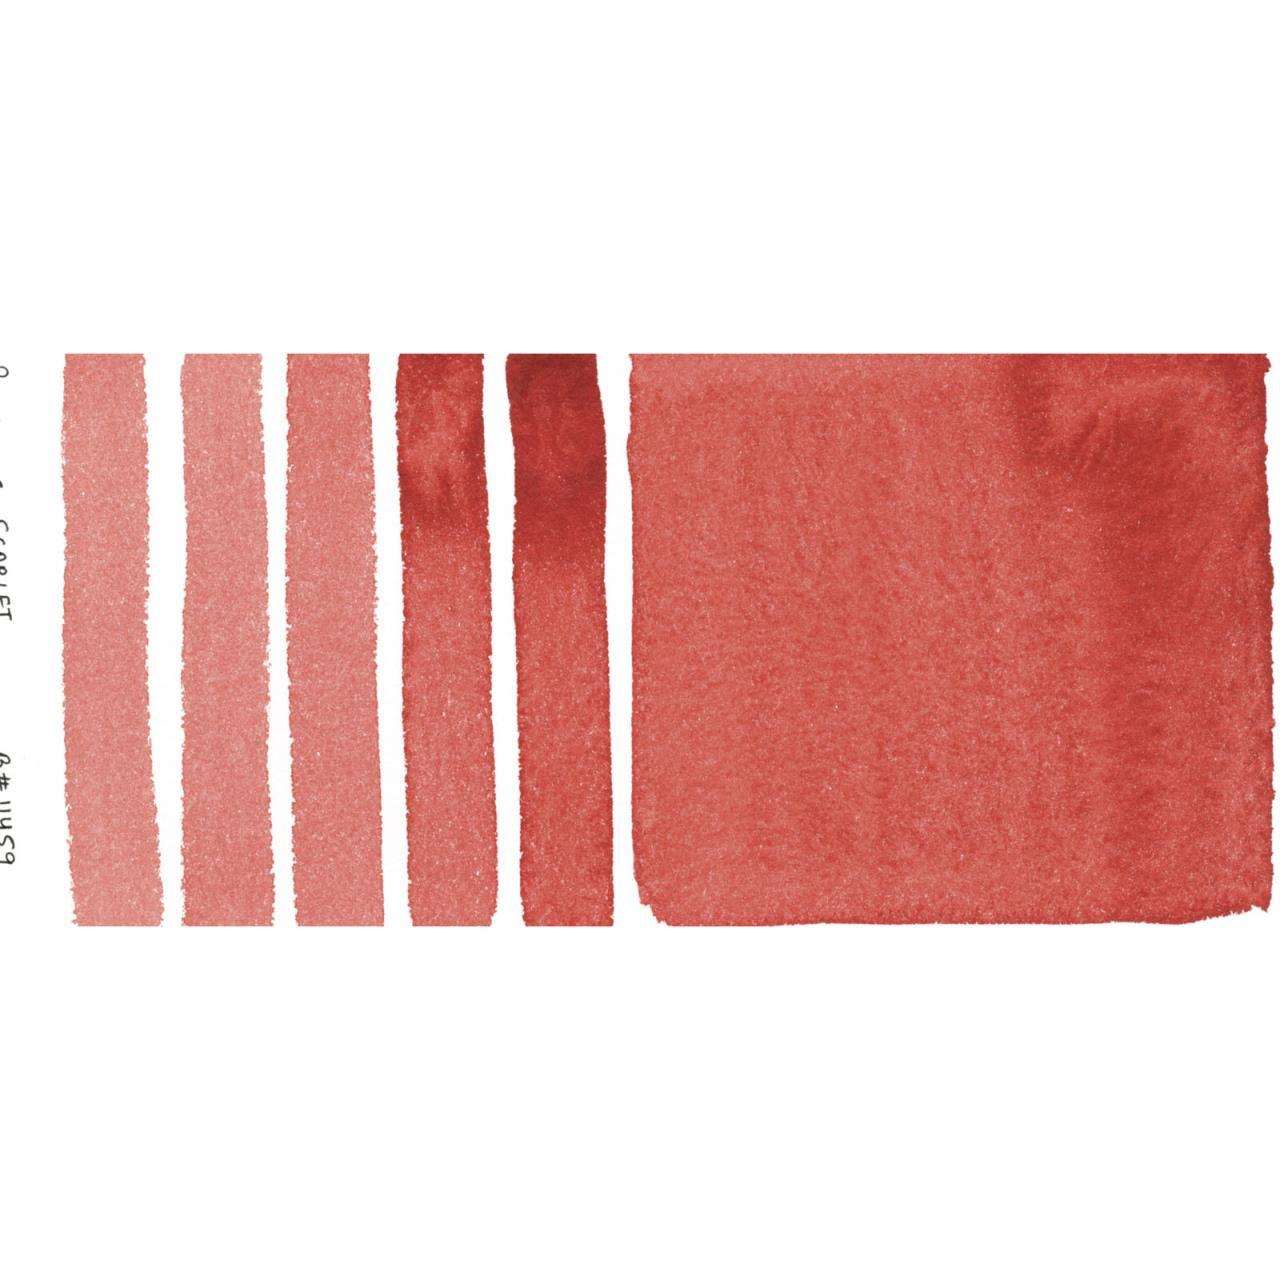 Perylene Scarlet, DANIEL SMITH Extra Fine Watercolors 15ml Tubes -